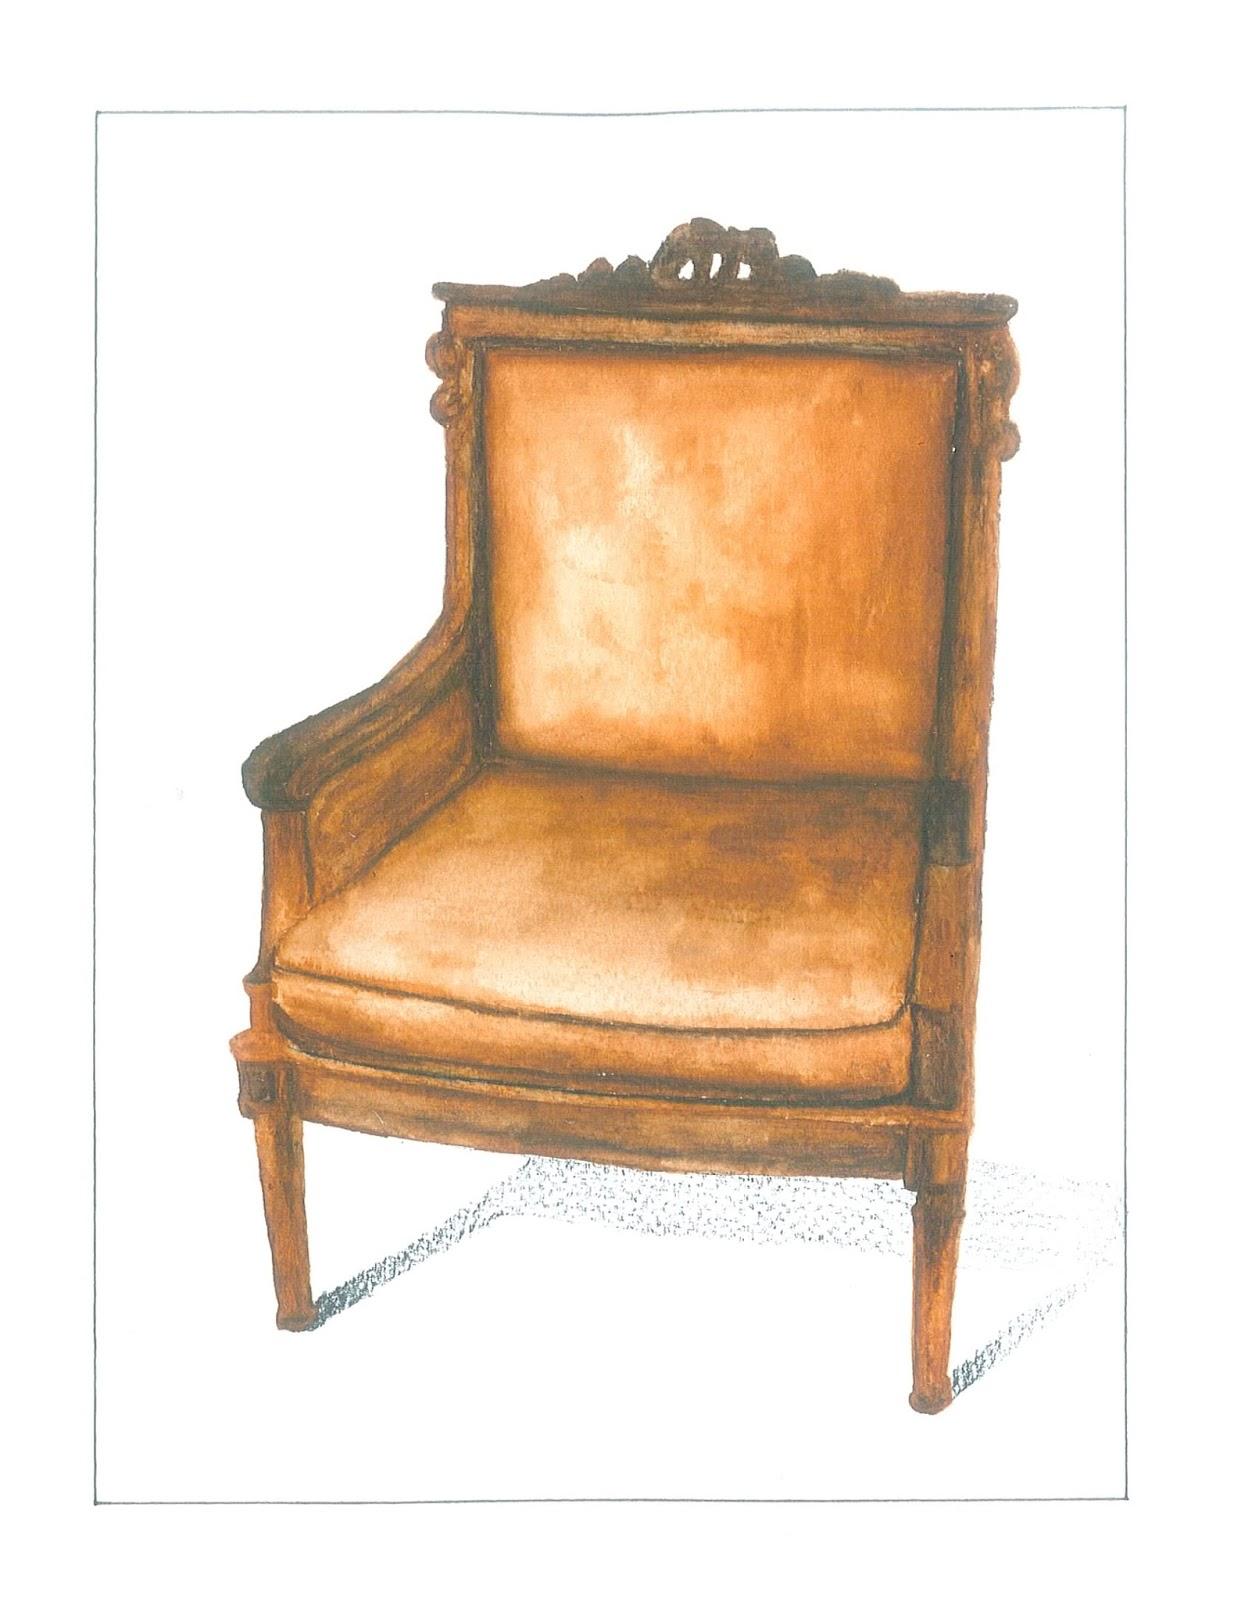 Muebles Estilo Neoclasico Apilable Muebles Saln Neoclasico  # Muebles Neoclasicos